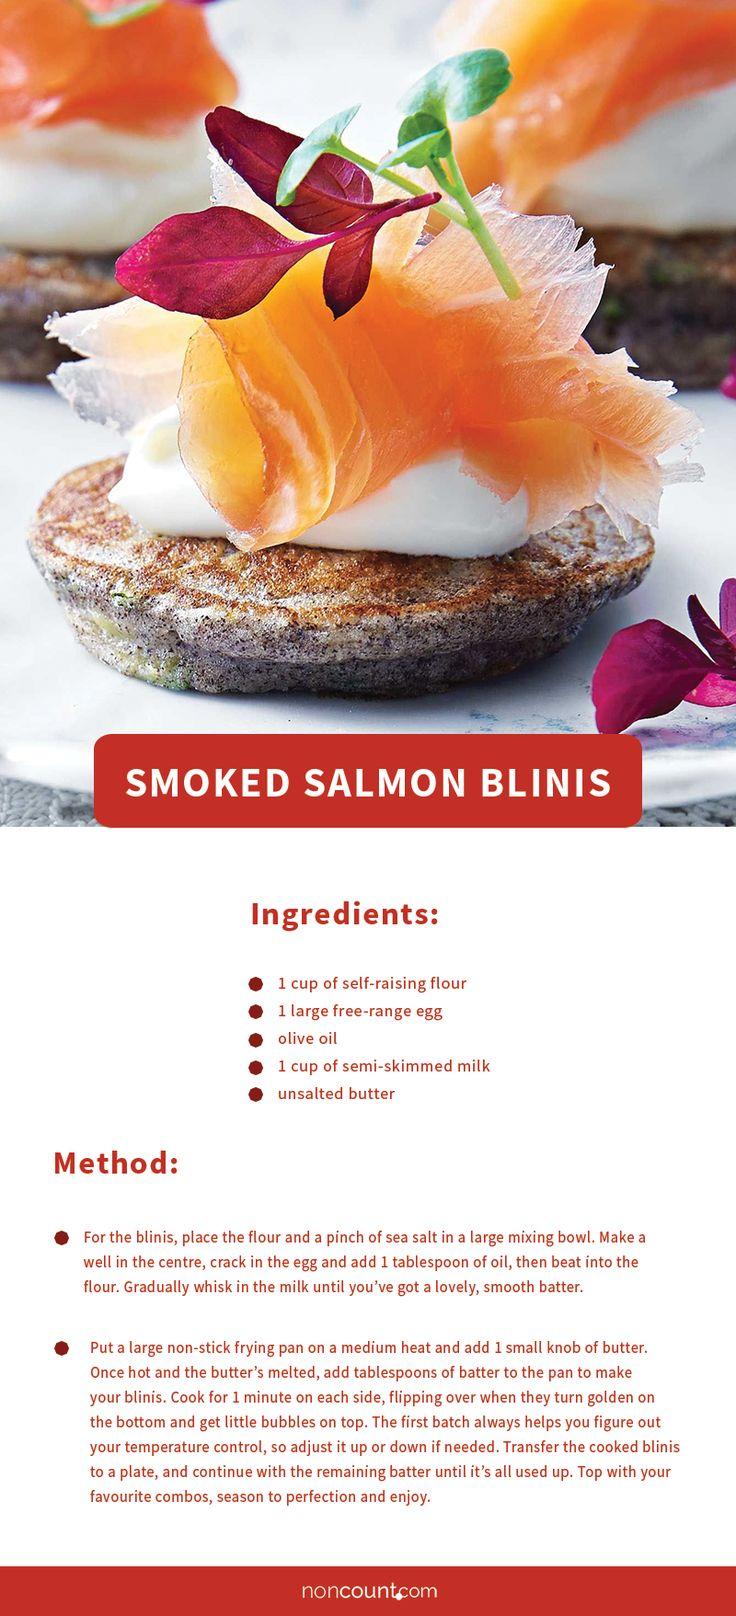 Smoked Salmon Blinis Party Food Recipe